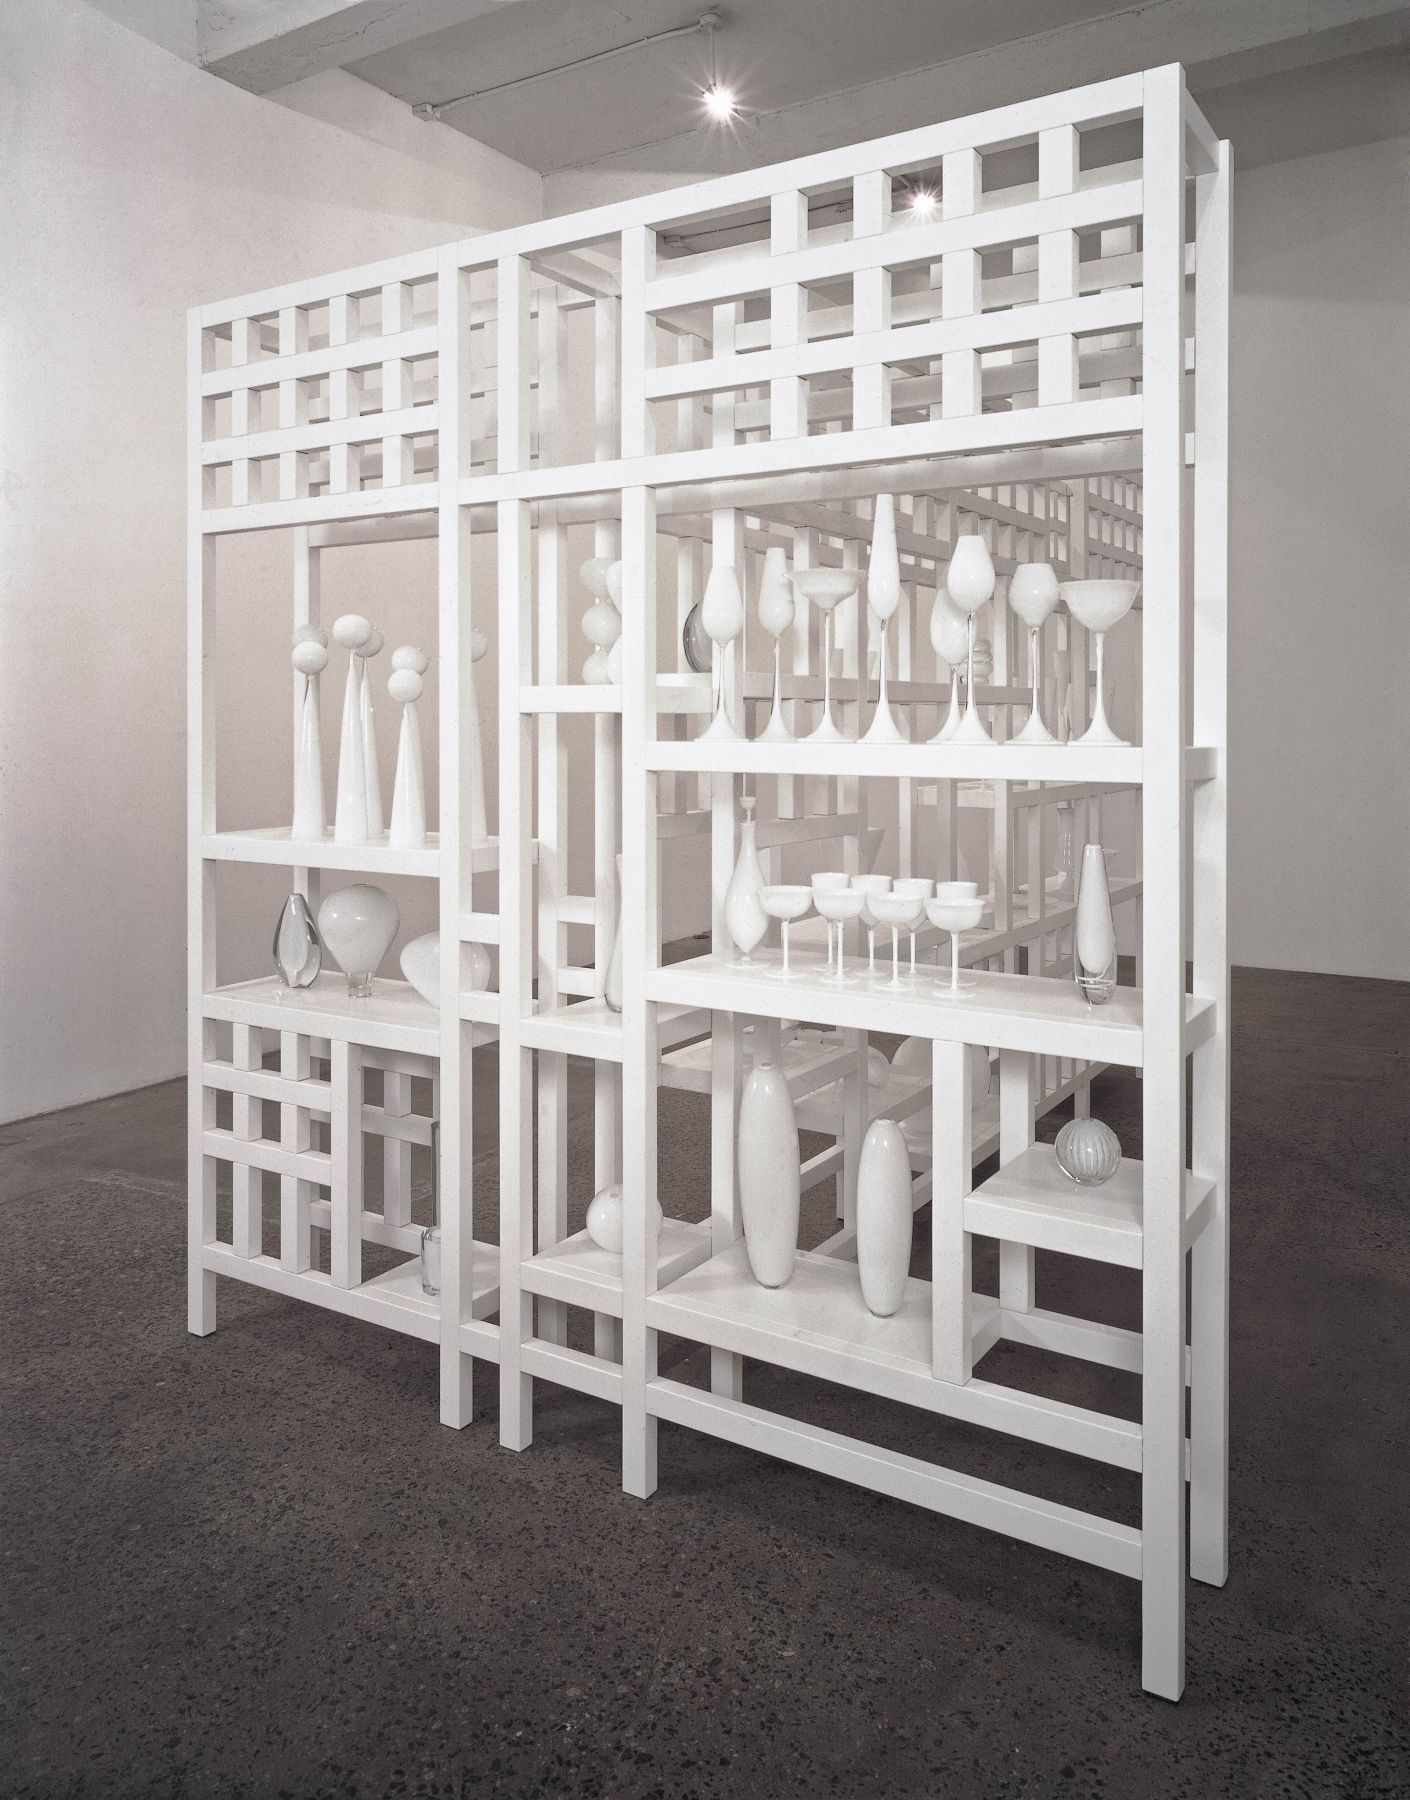 JOSIAH McELHENY, Untitled (White)